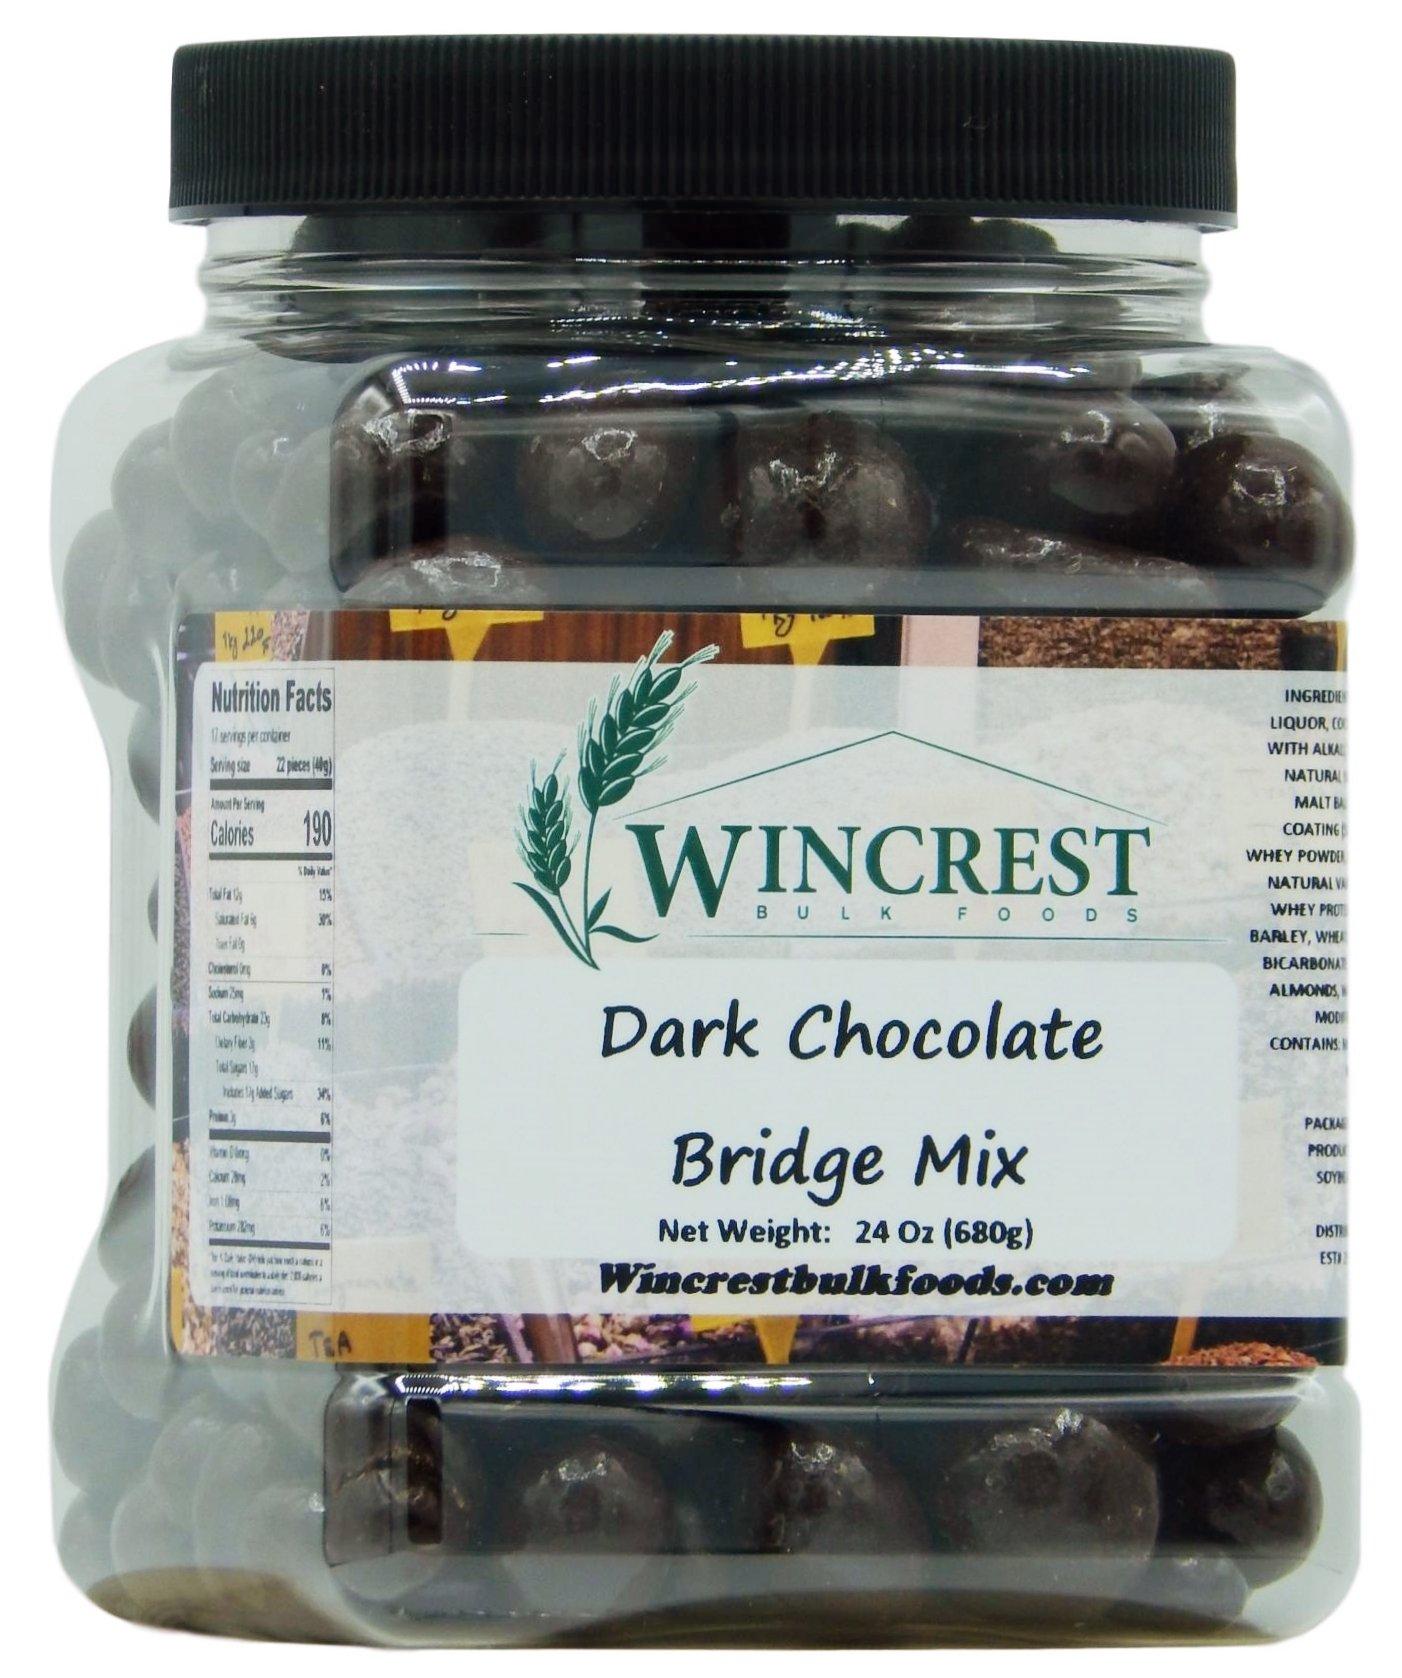 Dark Chocolate Bridge Mix - 1.5 Lb Tub by WinCrest BulkFoods